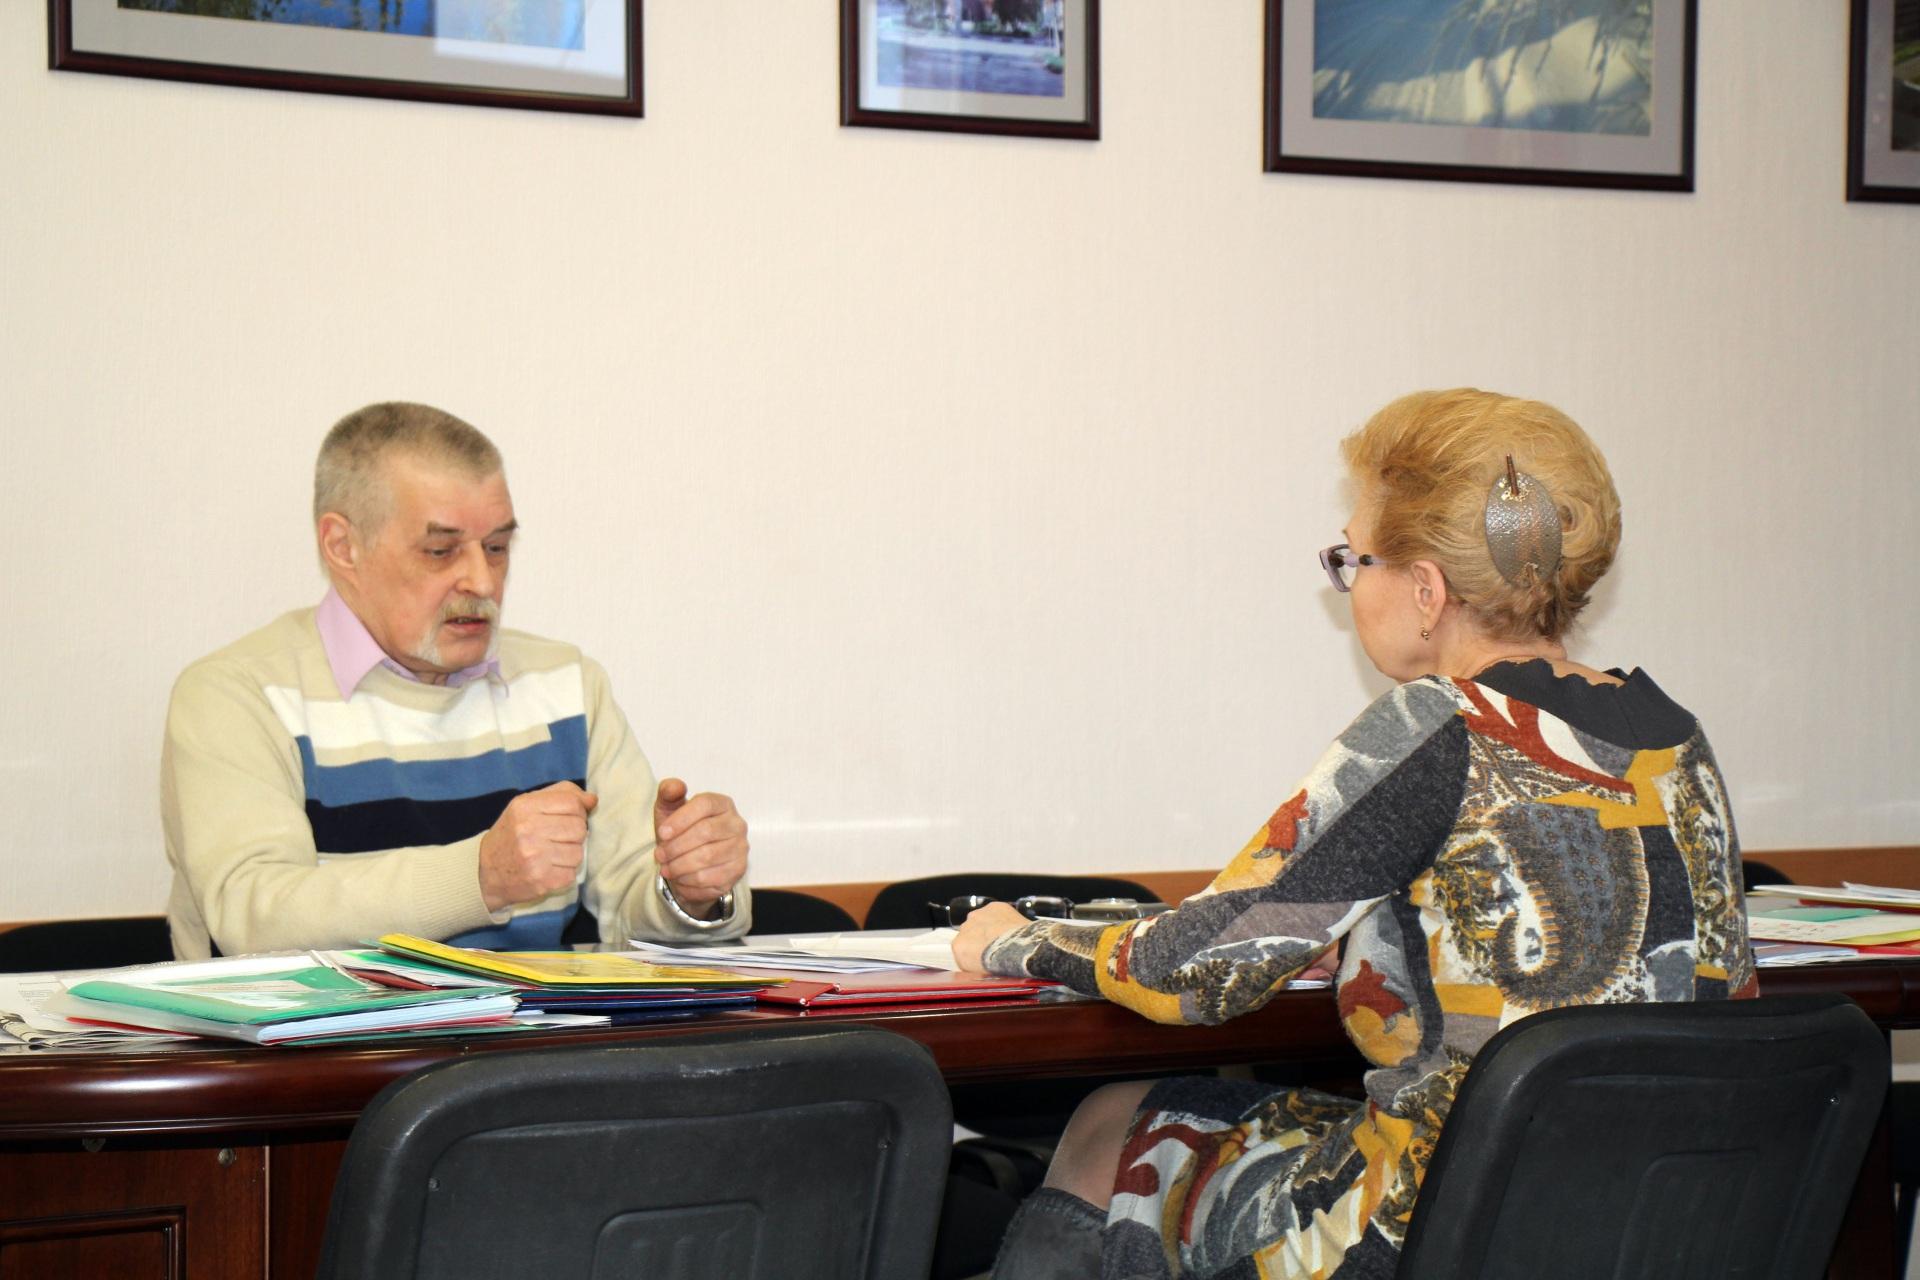 Модернизировать производство предложил интинец мэру Ларисе Титовец